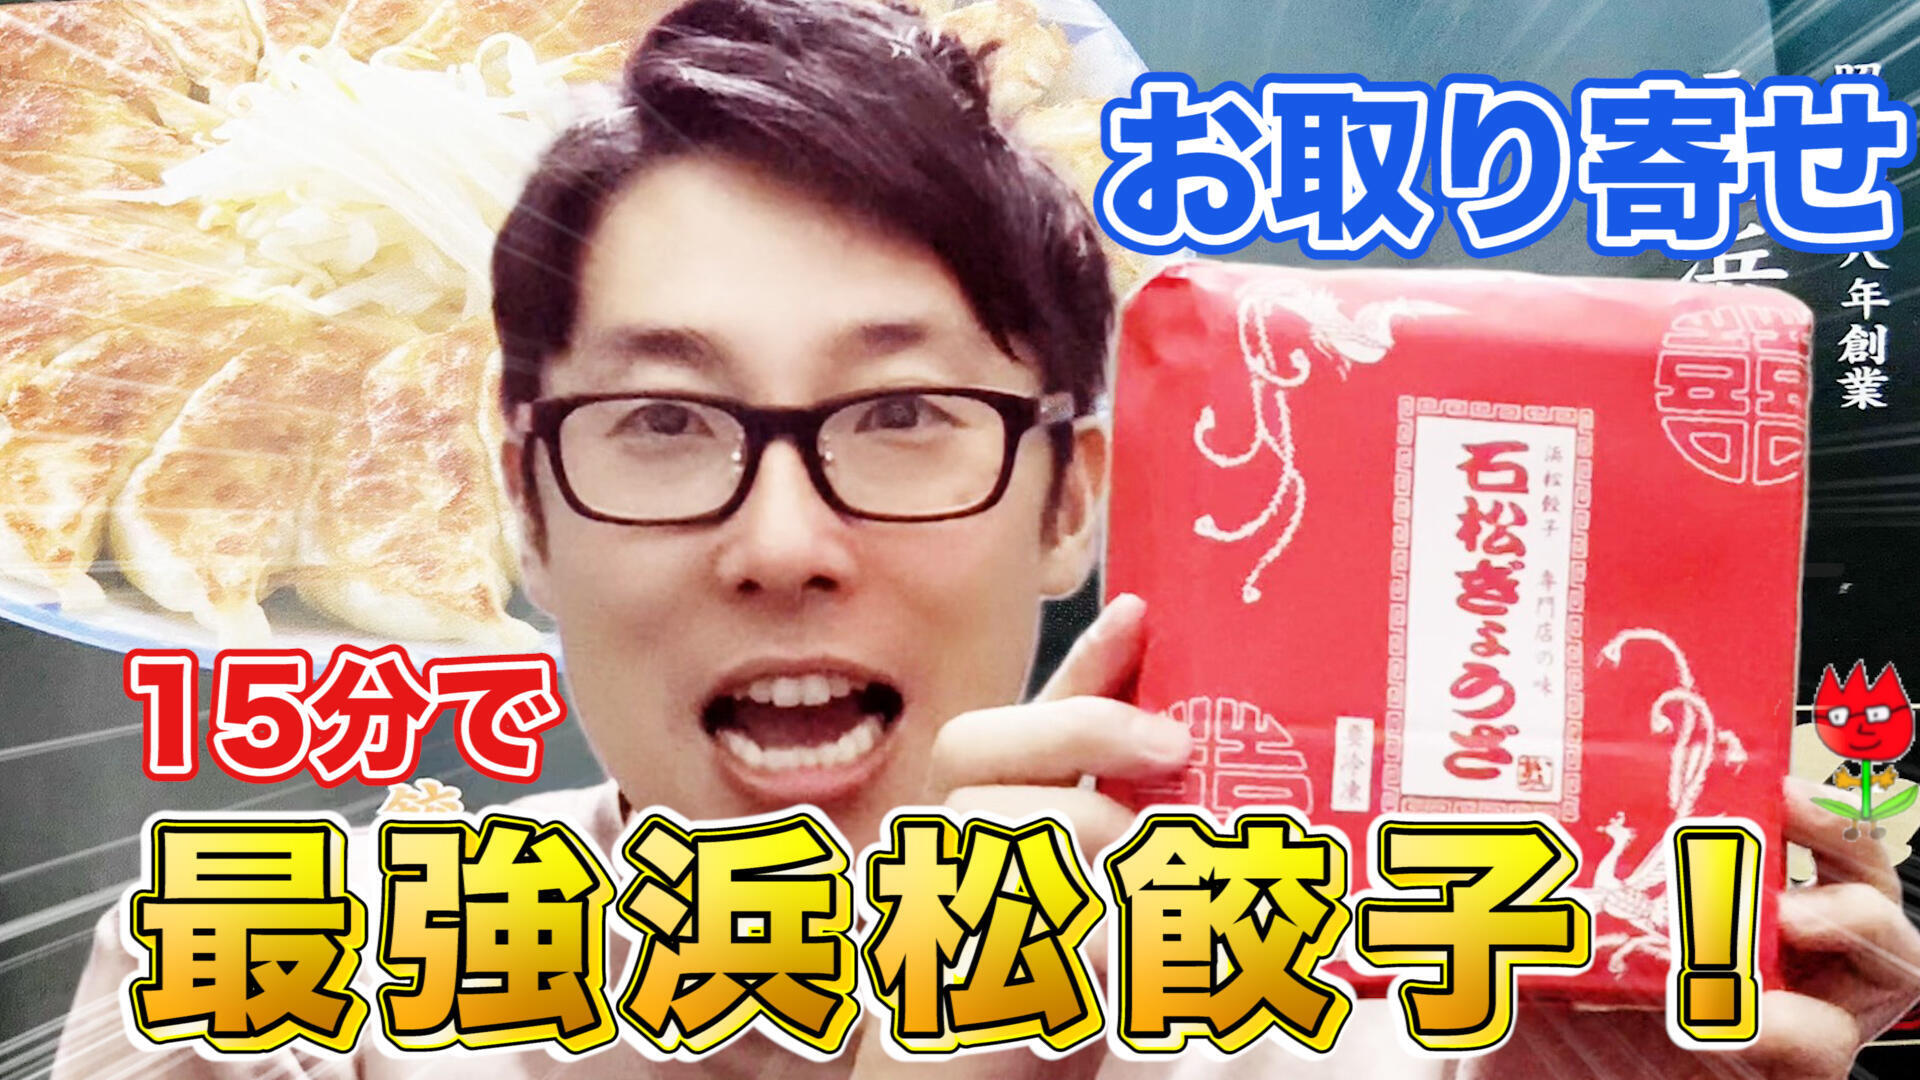 http://47web.jp/shizuoka/uploads/95328761dbd3fb449f054c306e35dbad2e1d6a6a.jpg